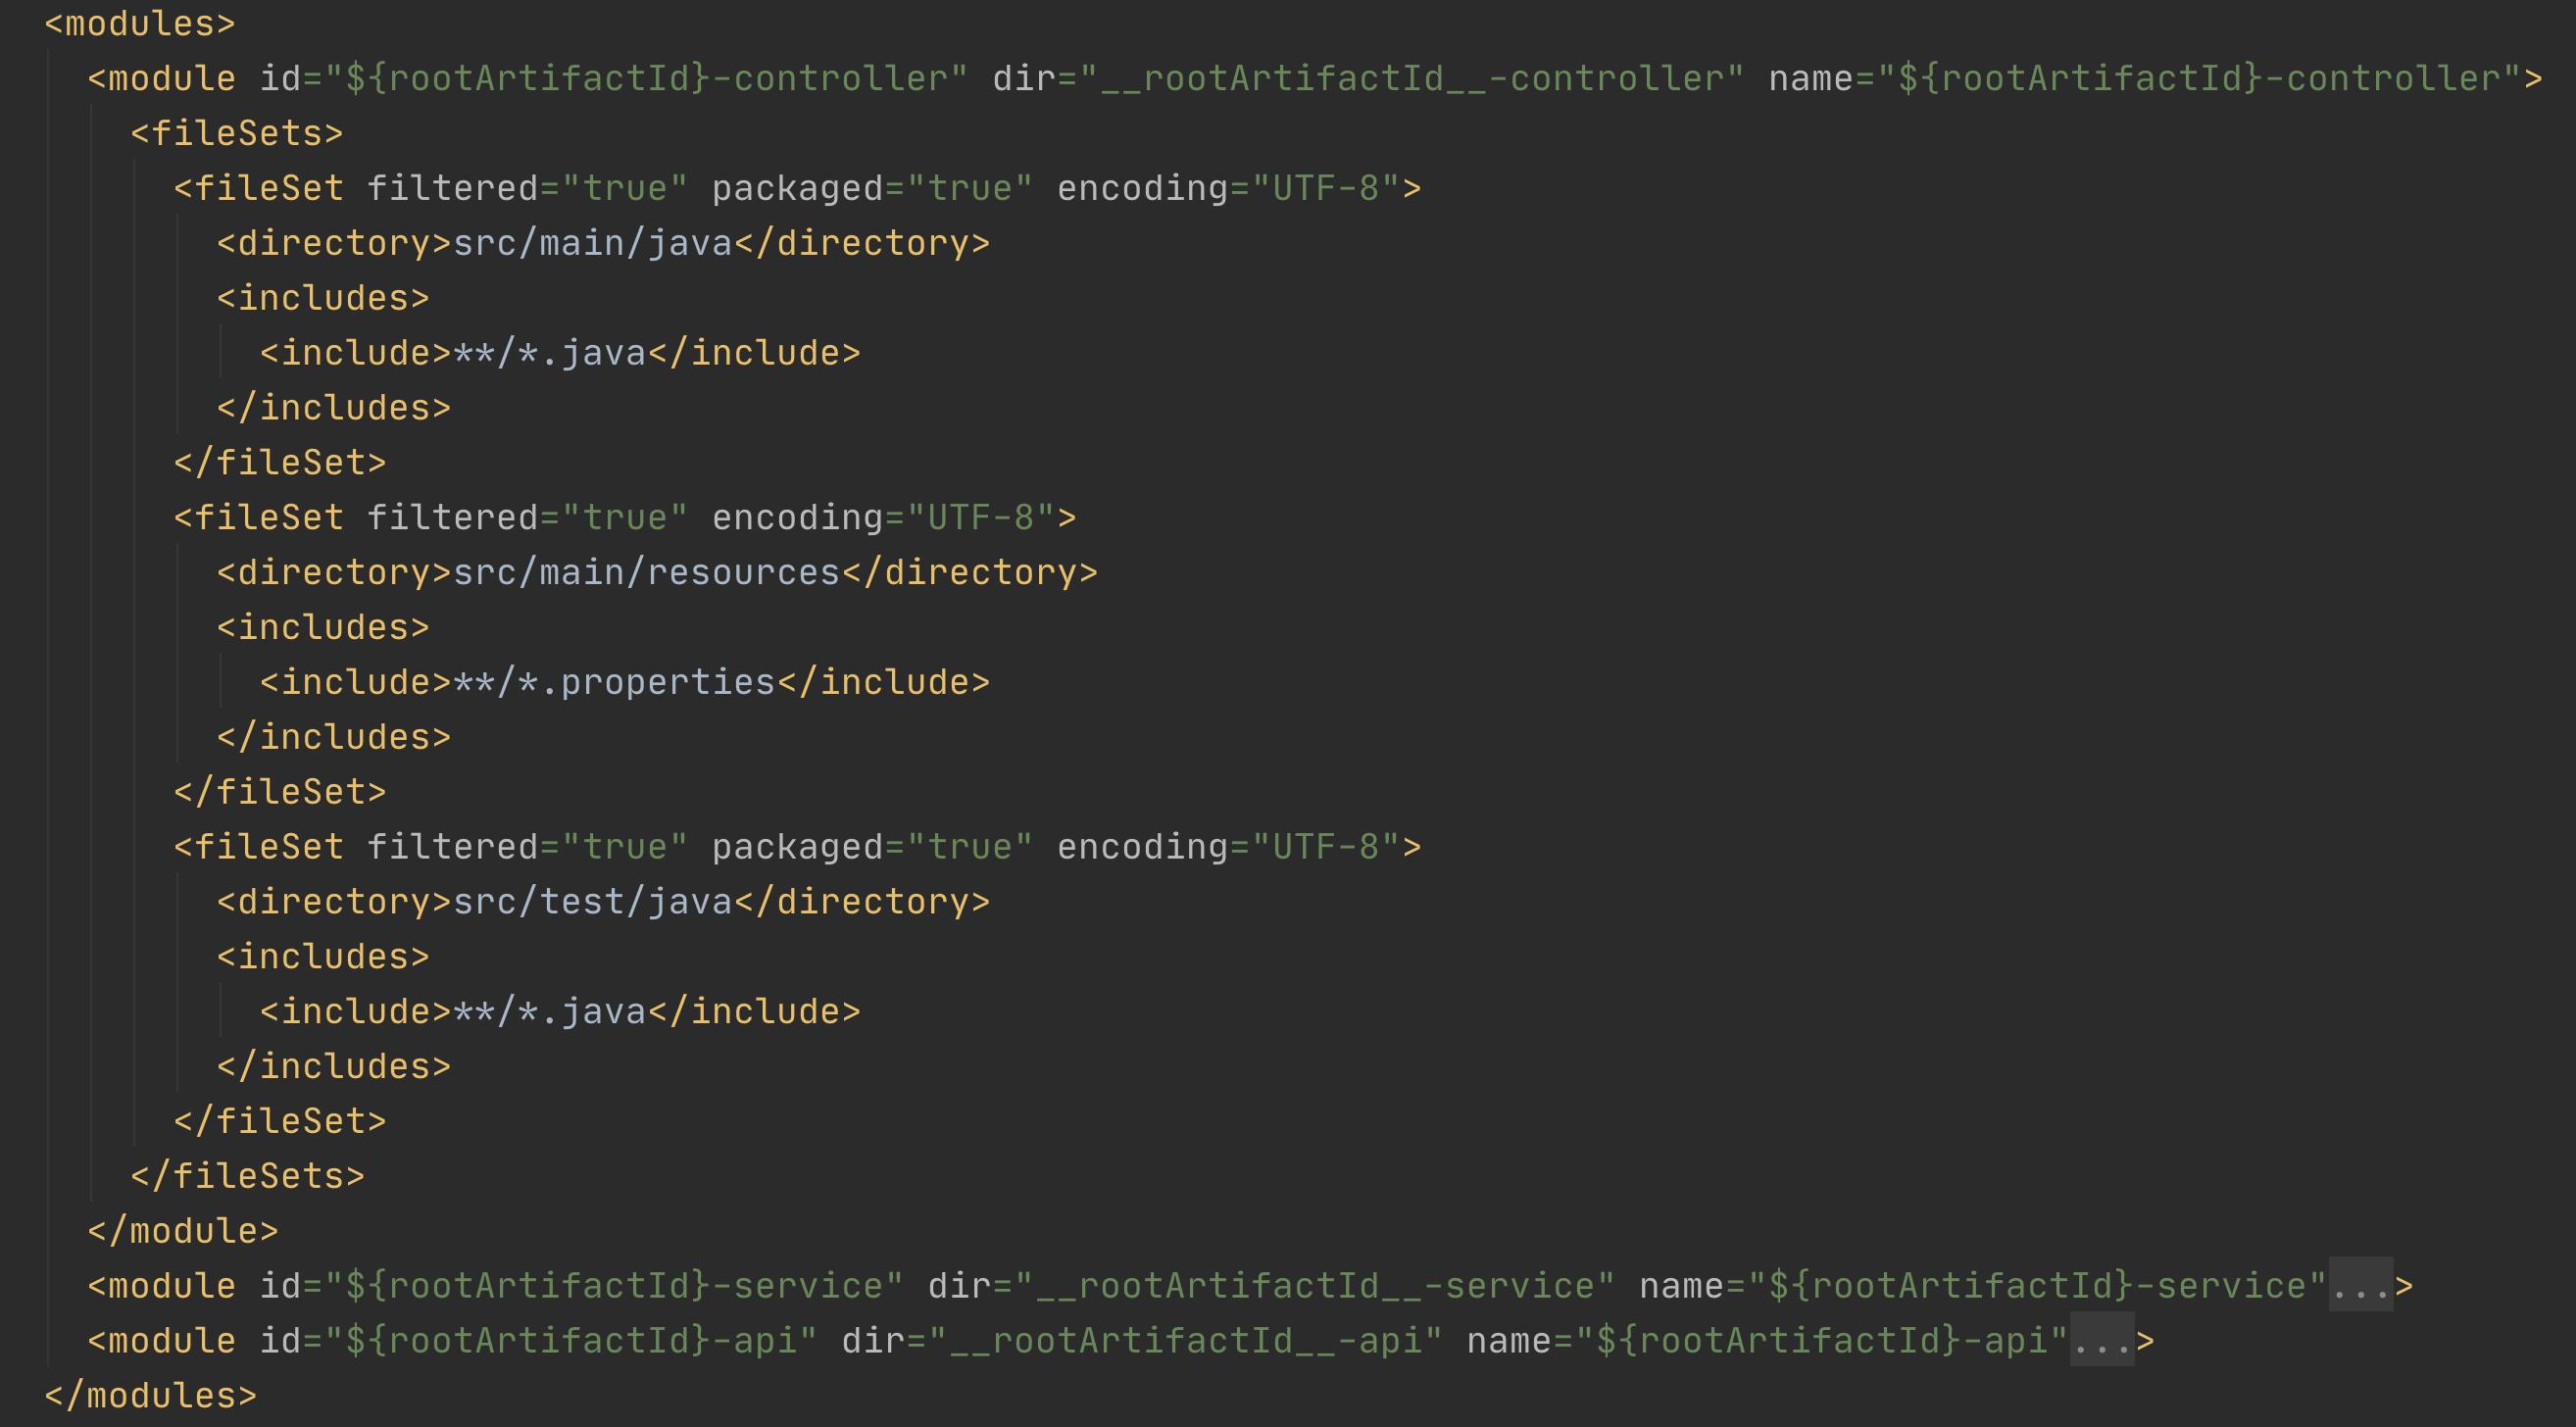 archetype-metadata2-HCnJqd